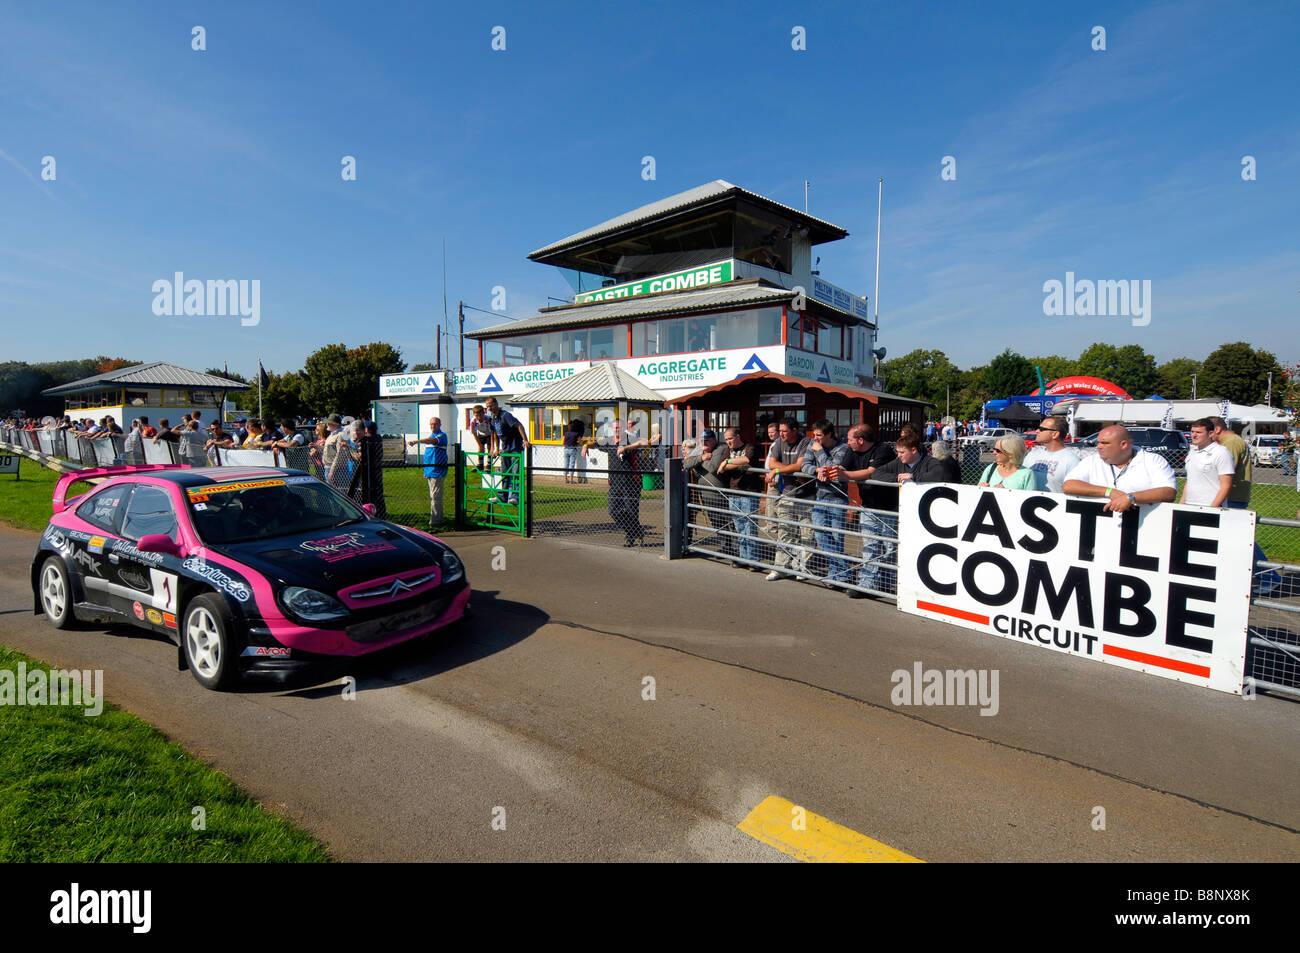 Castle Combe racing circuit in Wiltshire, Britain, UK - Stock Image